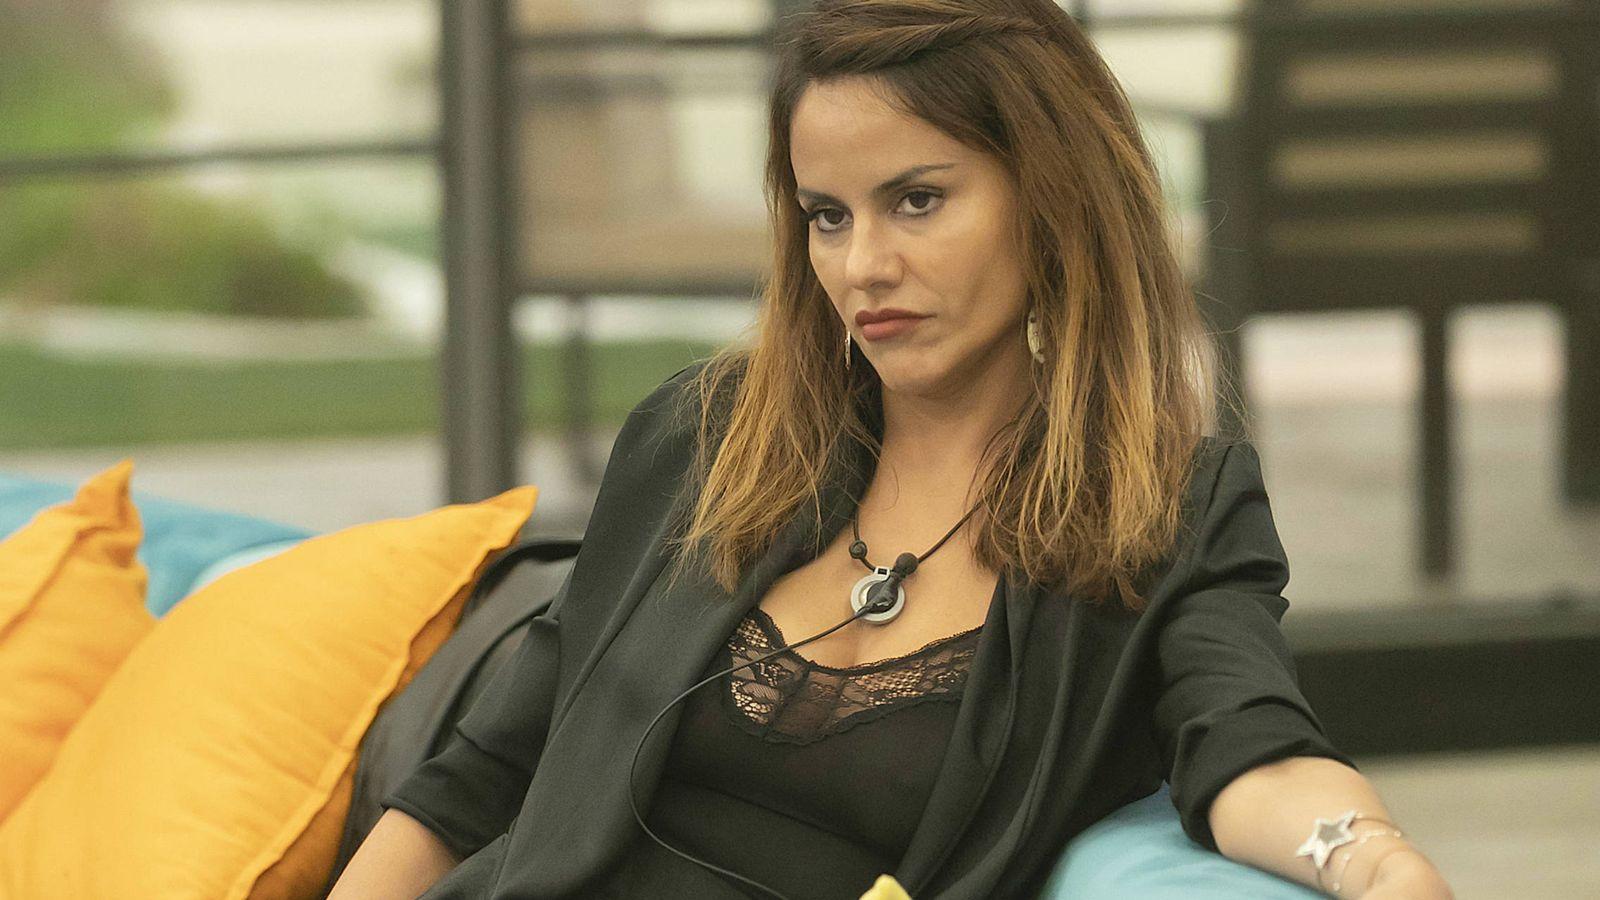 Celebrity Monica Hoyos nude (62 photos), Topless, Paparazzi, Twitter, panties 2006